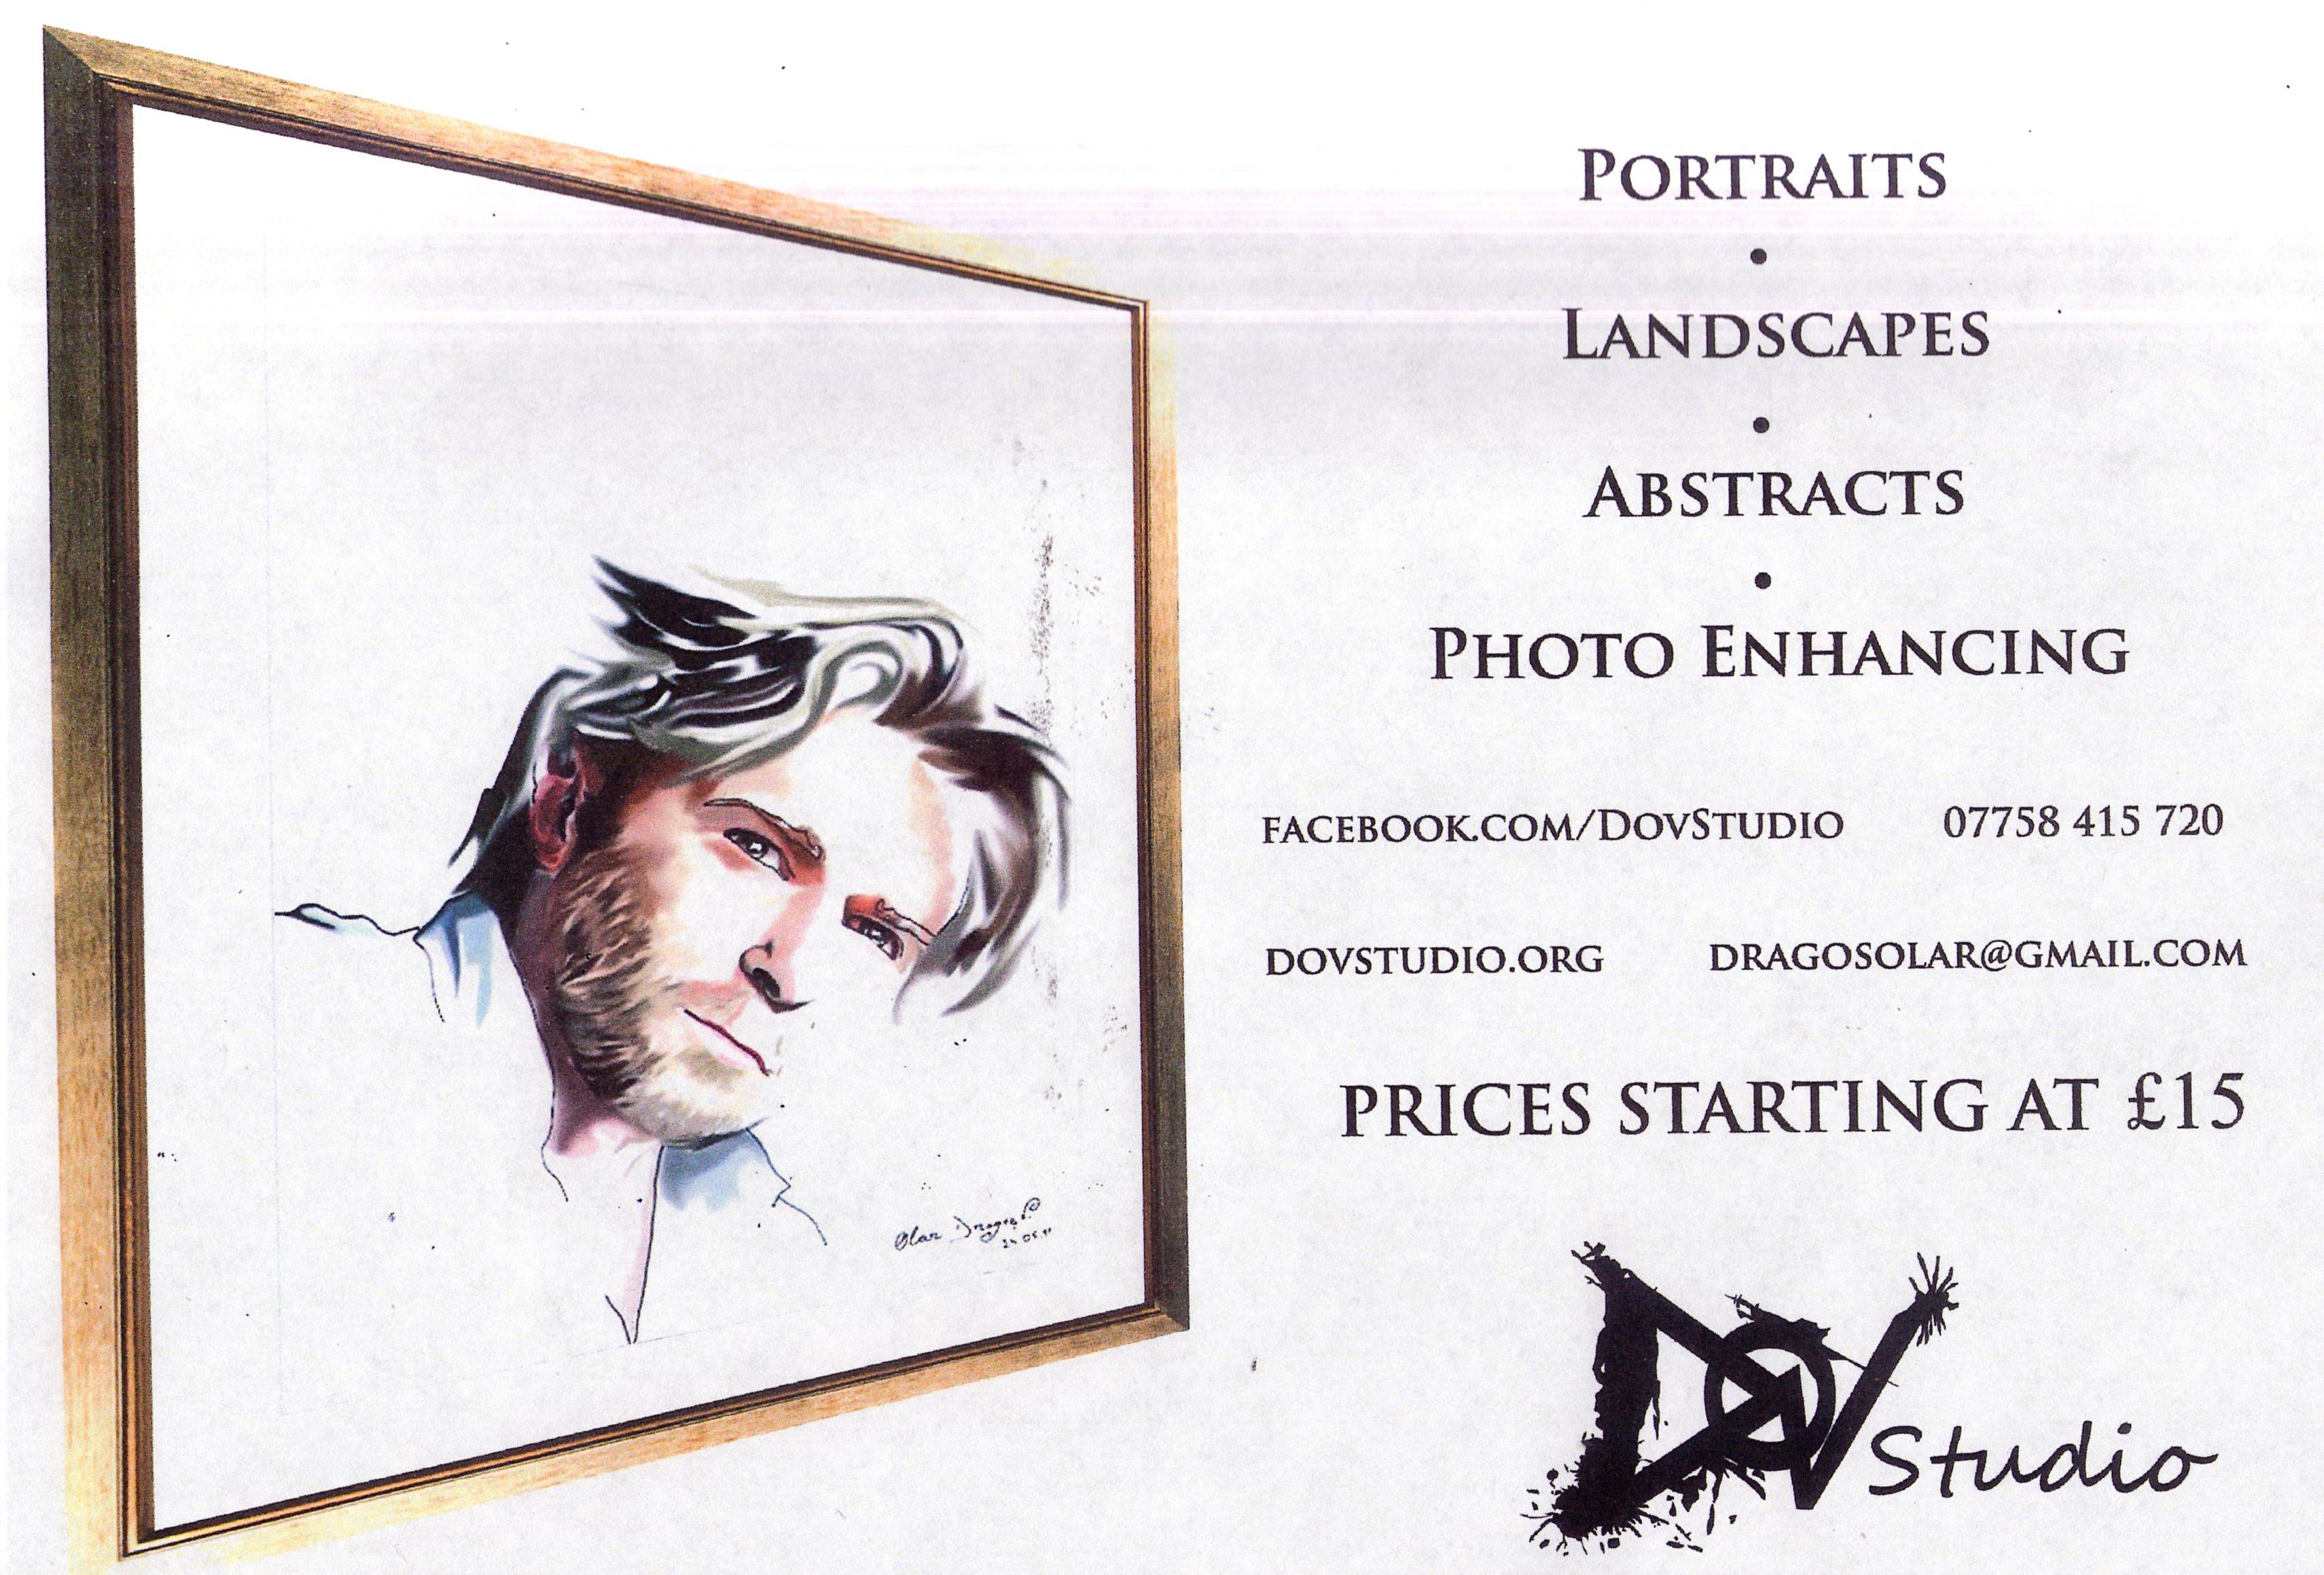 DOV Studio